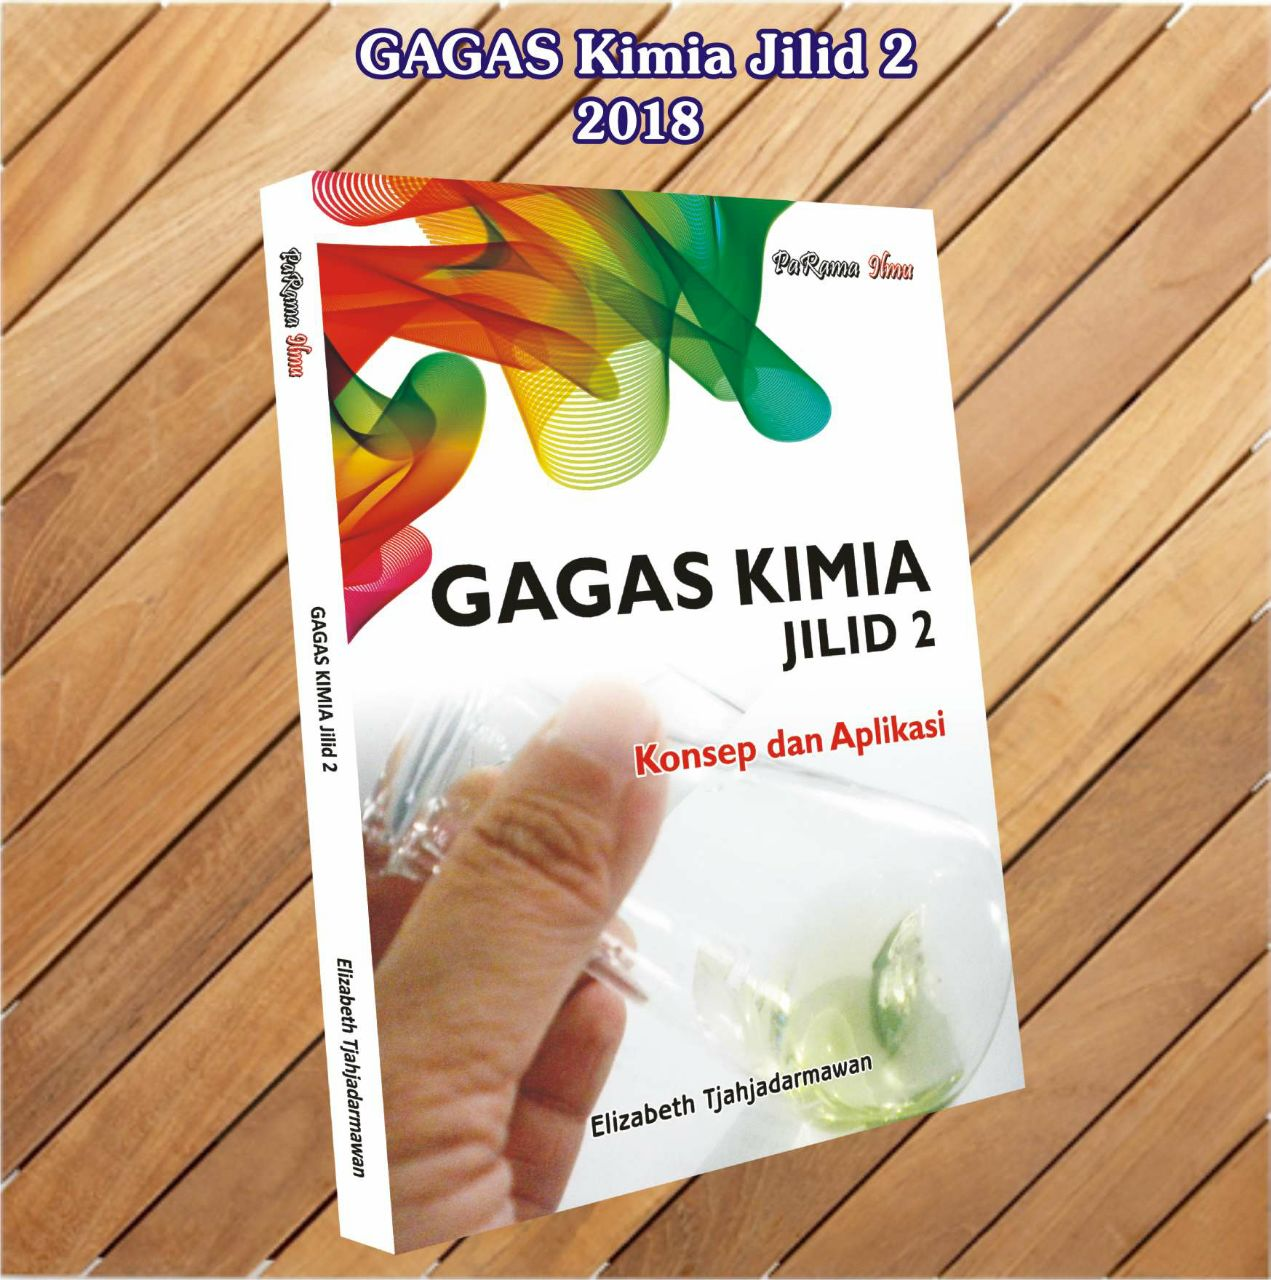 LAUNCHING:  GAGAS KIMIA JILID 2: Elizabeth Tjahjadarmawan, S.Si, M.Pd